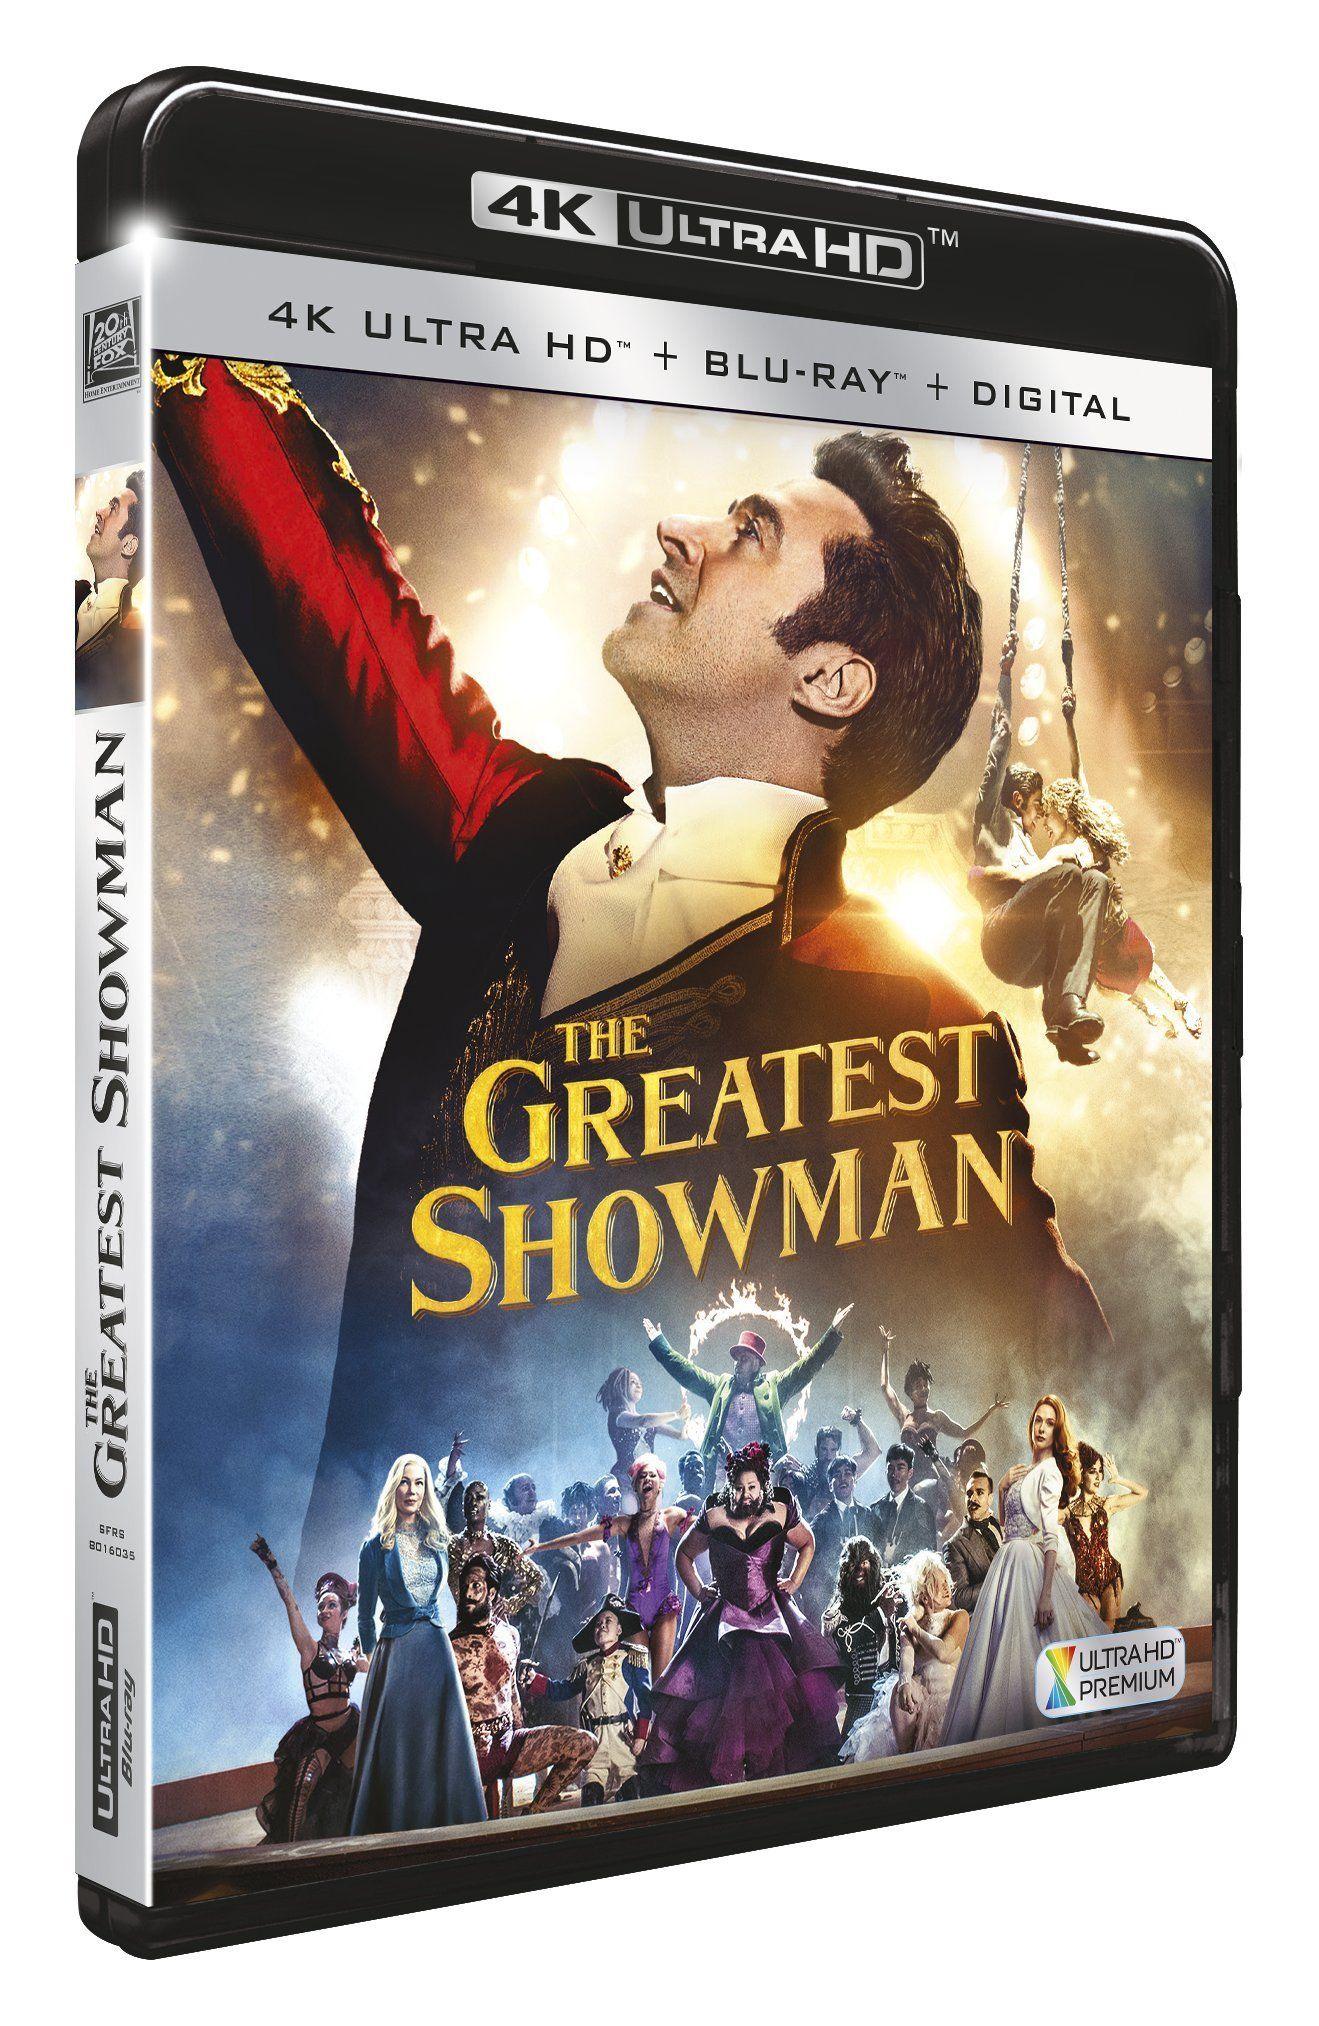 The Greatest Showman Francia Blu Ray Showman Greatest Francia Ray The Greatest Showman 4k Uhd